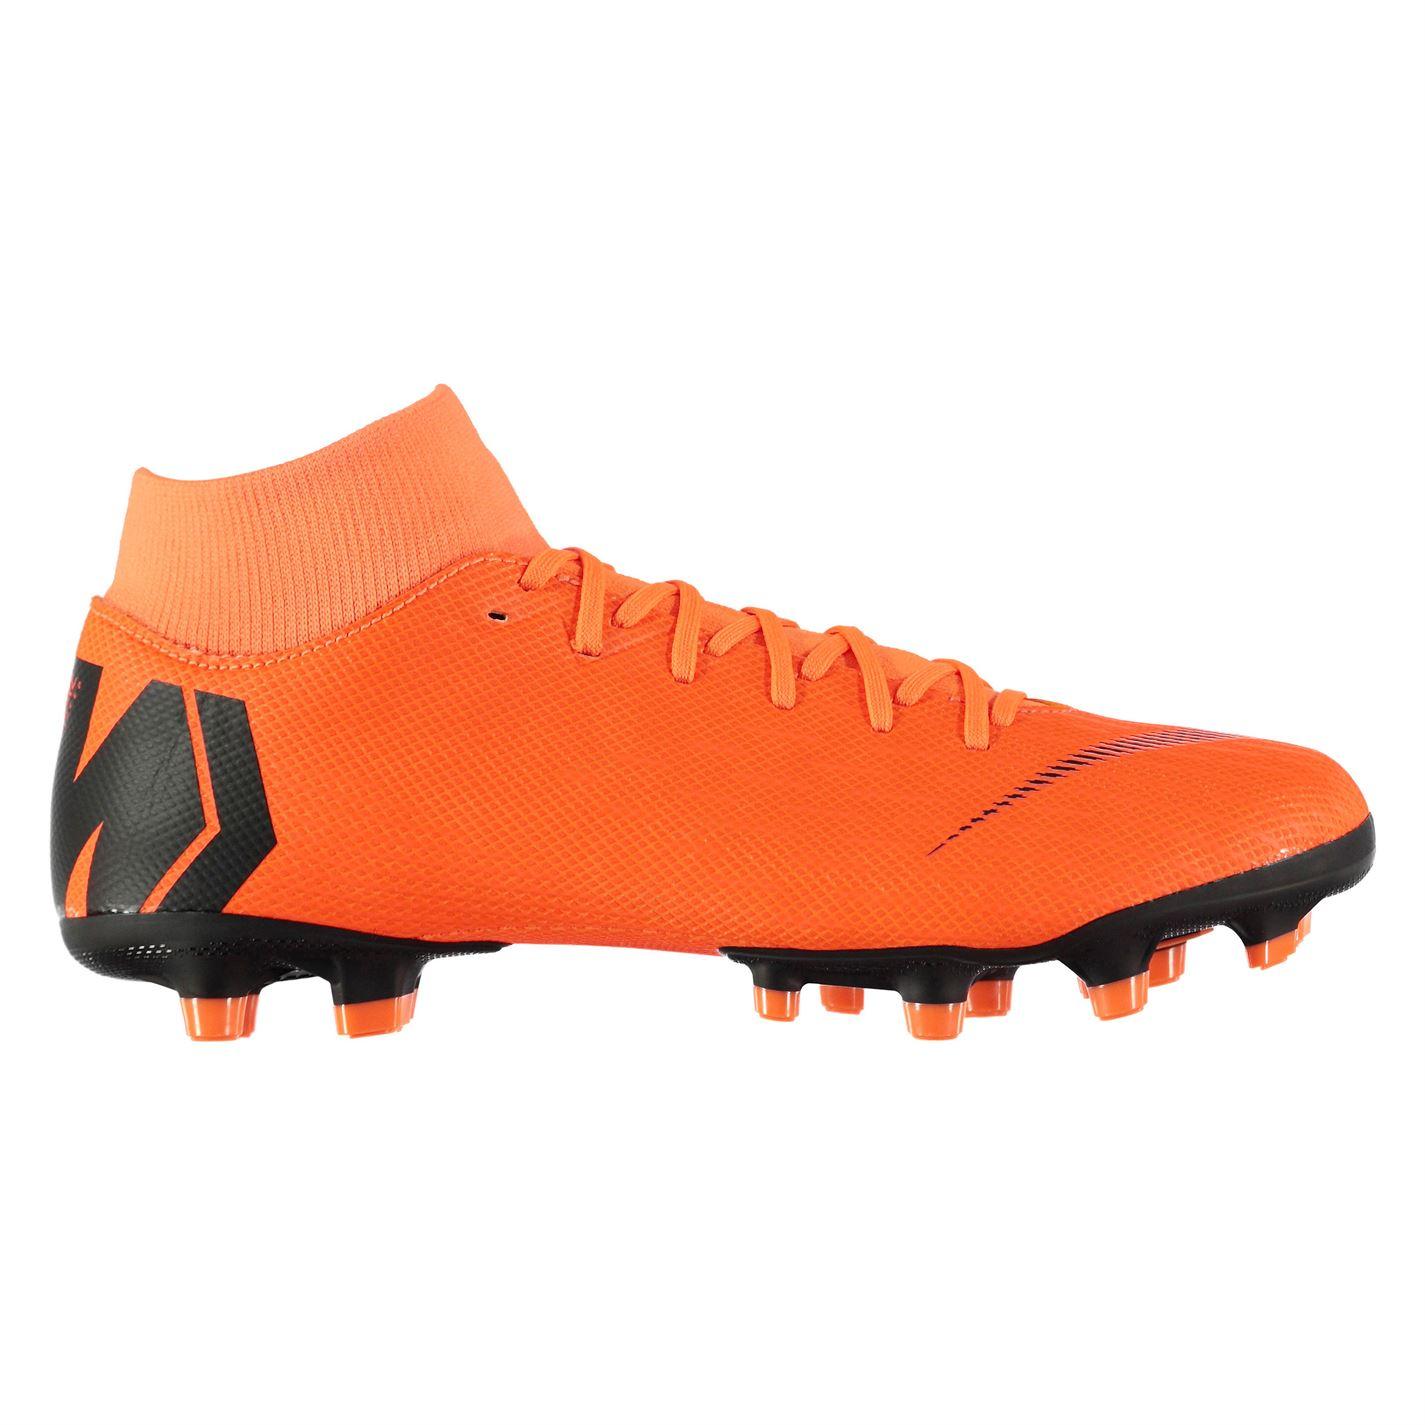 Nike Mercurial Superfly Academy Mens FG Football Boots